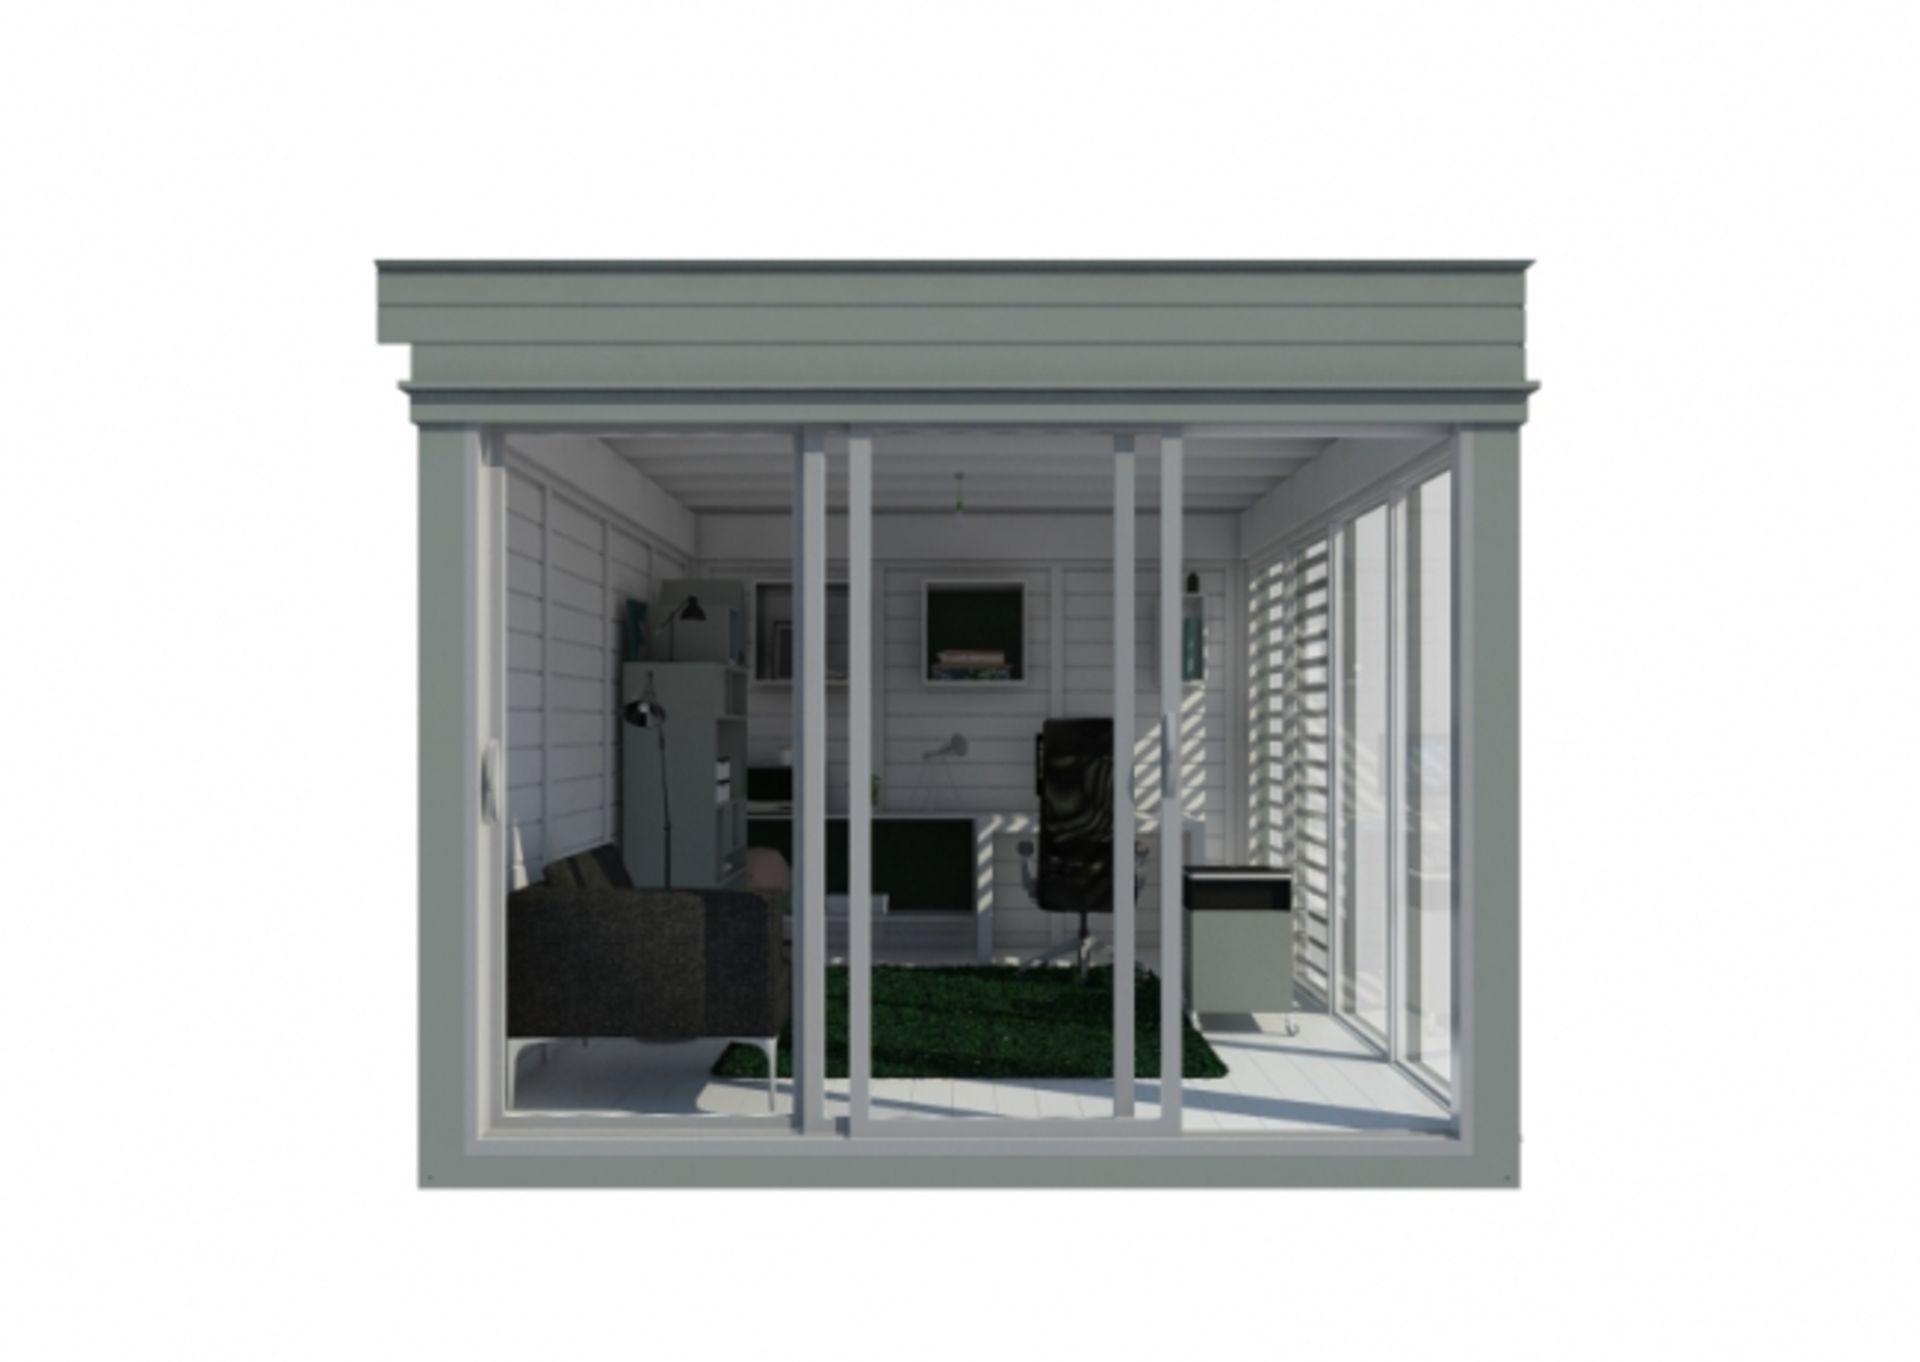 Lot 19034 - + VAT Brand New Insulated 3m x 4m Garden Office Cube With Glass Sliding Doors - Sunscreen